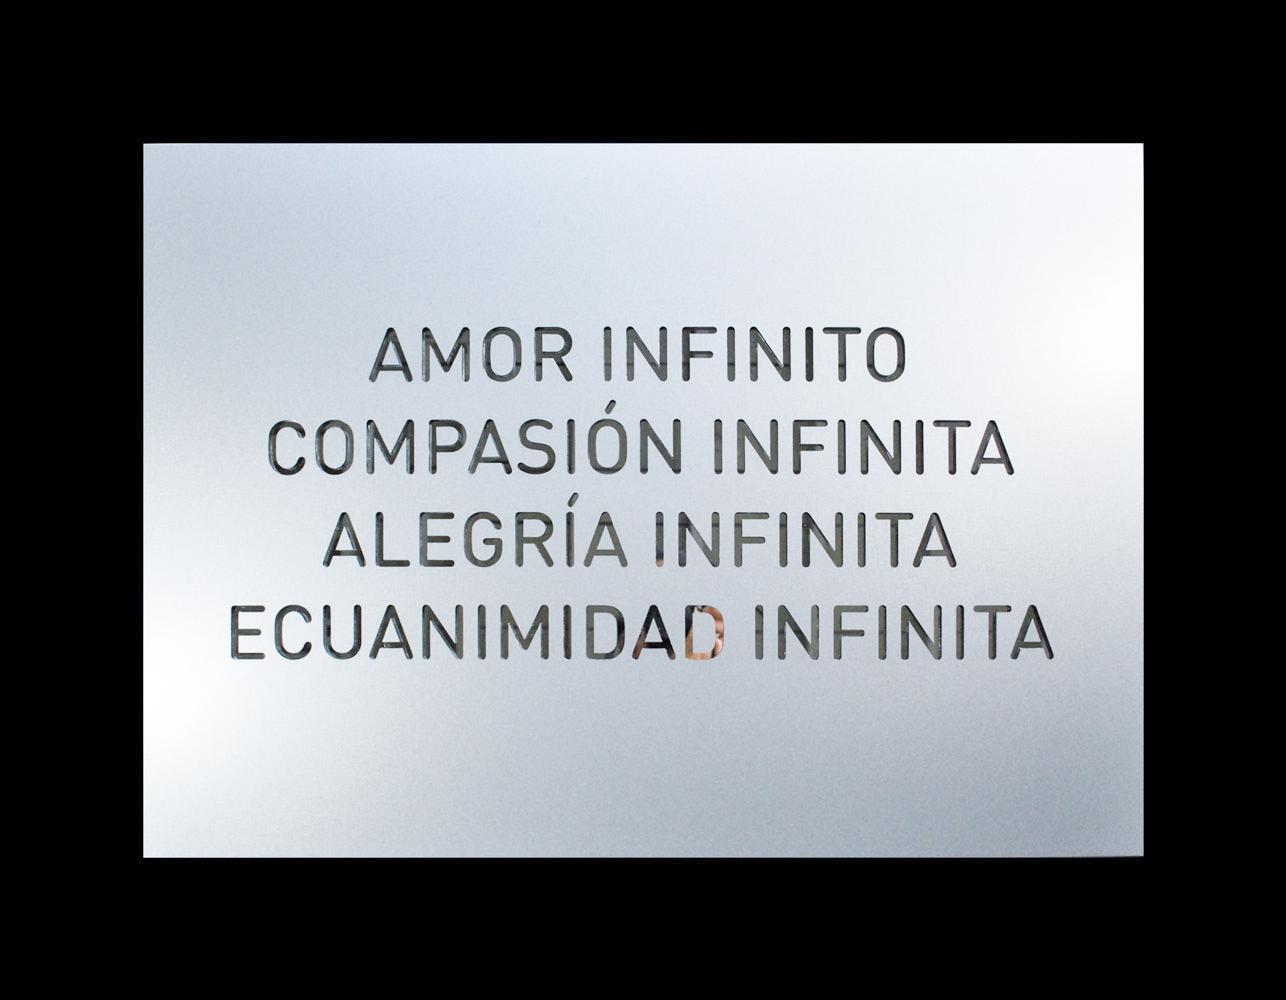 amor-infinito-compasion-infinita-alegria-infinita-ecuanimidad-infinita